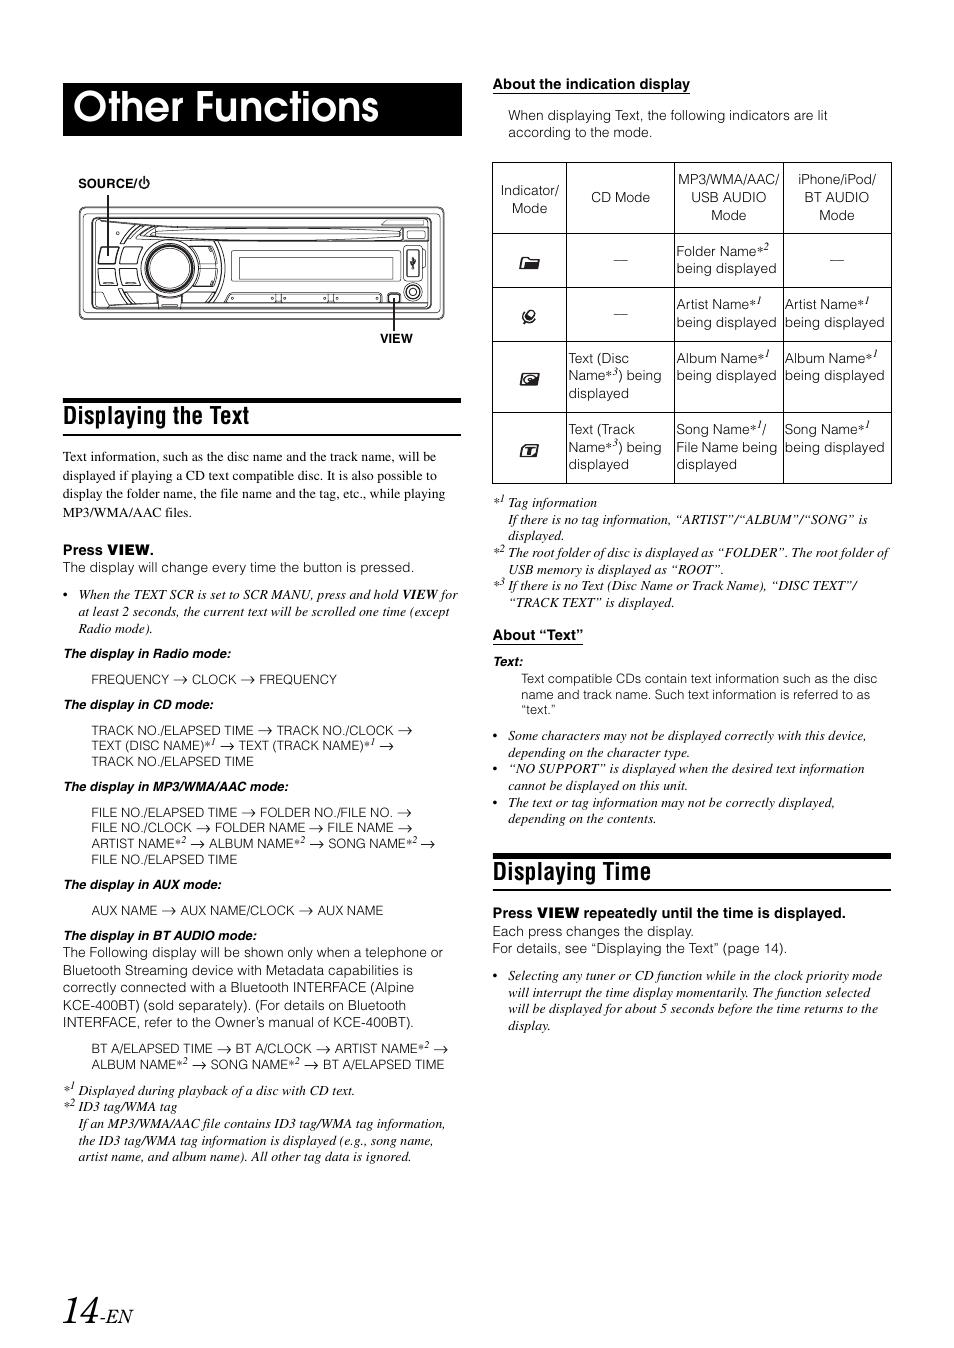 fancy alpine cde 102 wire diagram component electrical diagram rh itseo info Alpine CDE 100 Manual Alpine CDE 101